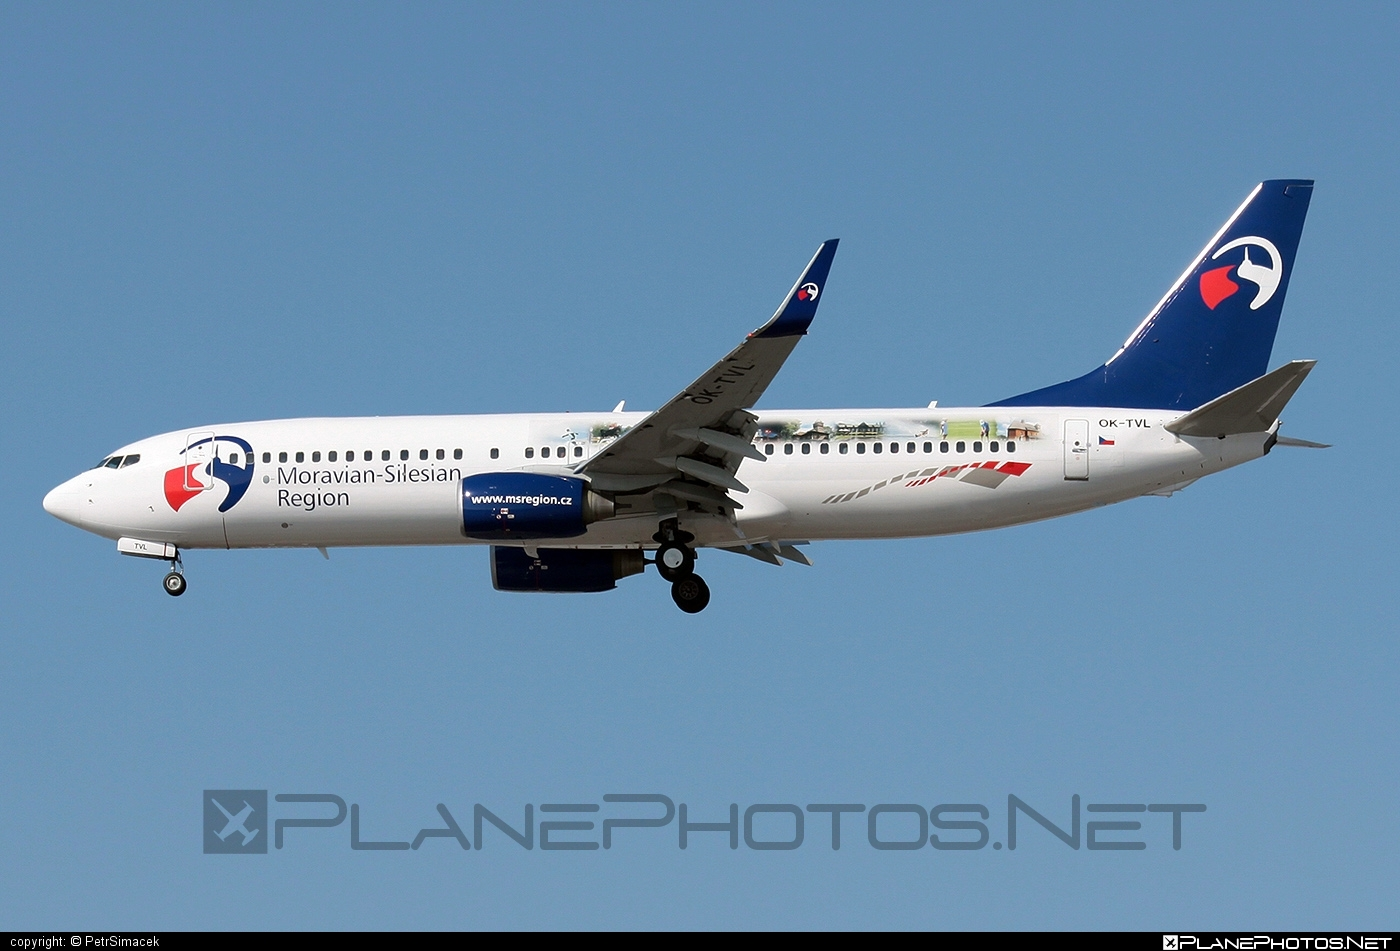 Boeing 737-800 - OK-TVL operated by Travel Service #b737 #b737nextgen #b737ng #boeing #boeing737 #travelservice